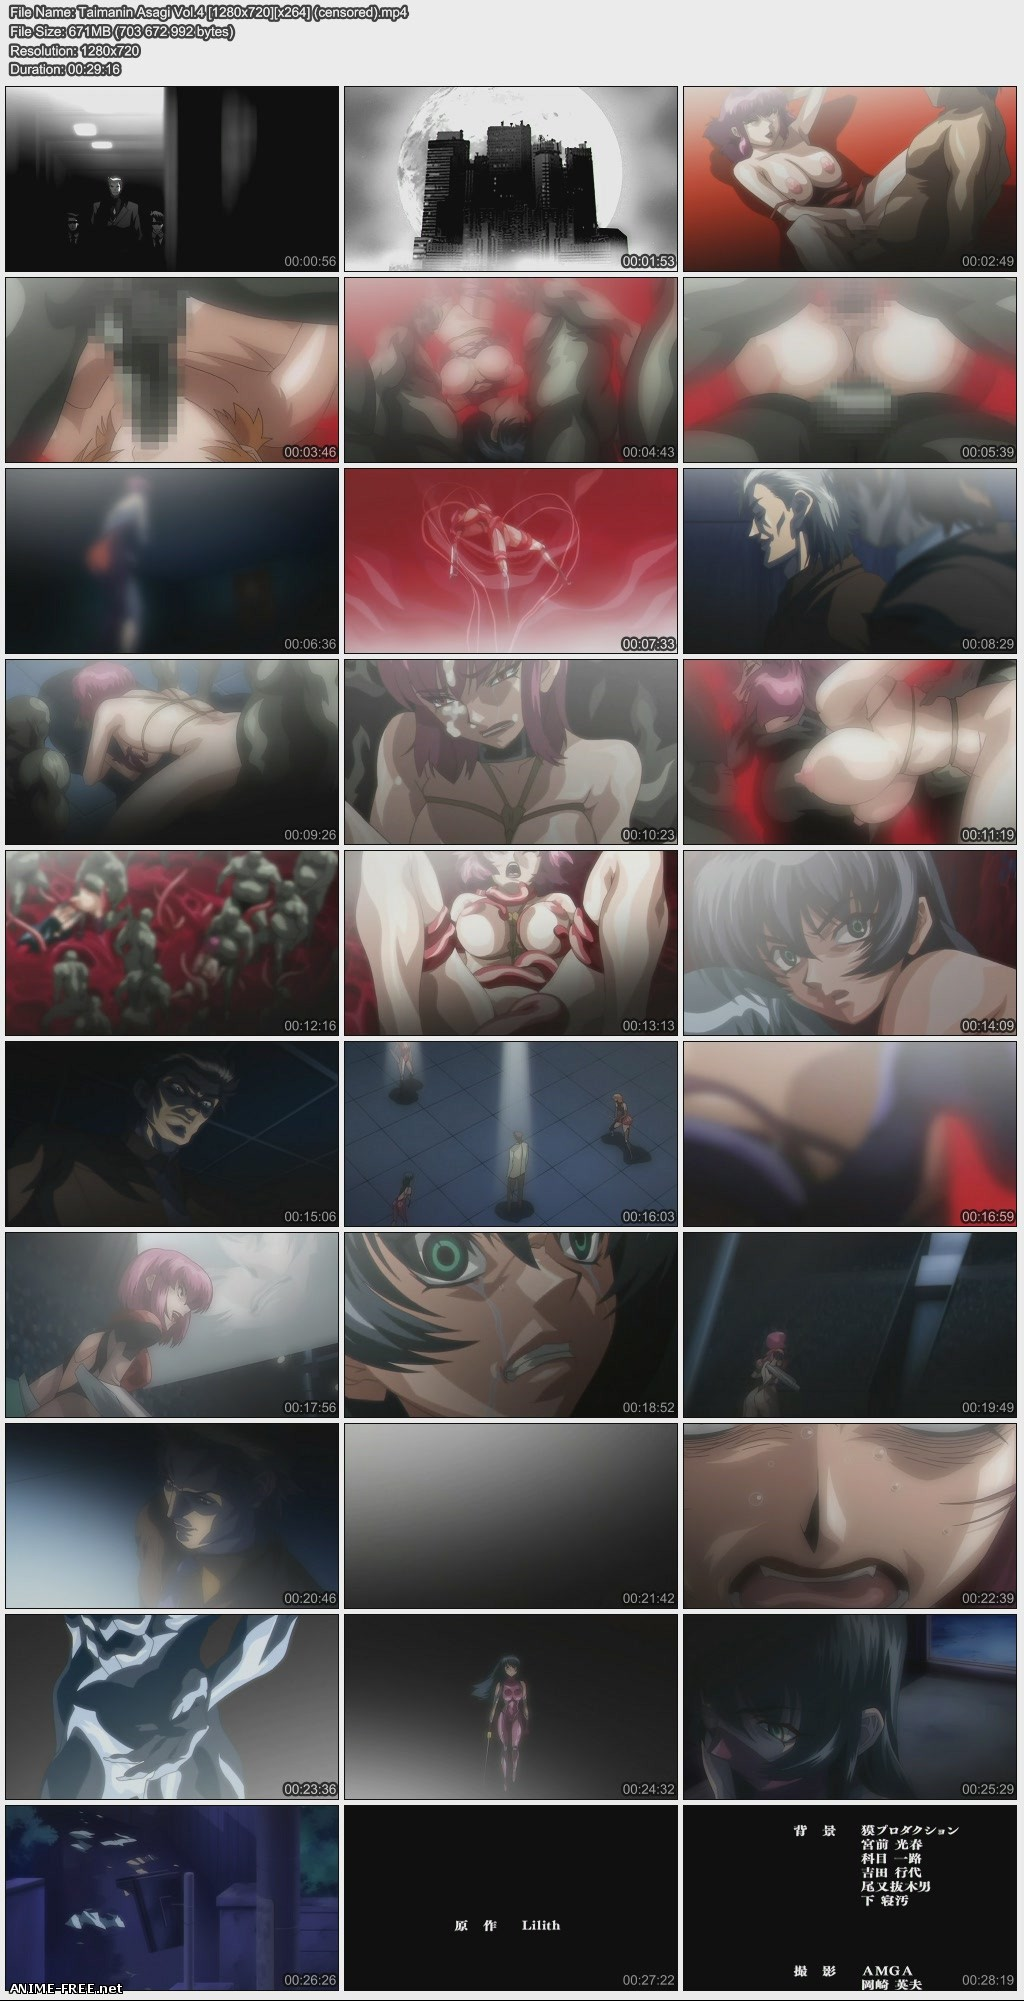 Воительницы с демонами / Taimanin Asagi / Anti Demon Ninja Asagi [4 из 4] [720p] [RUS,ENG,JAP] Anime Hentai